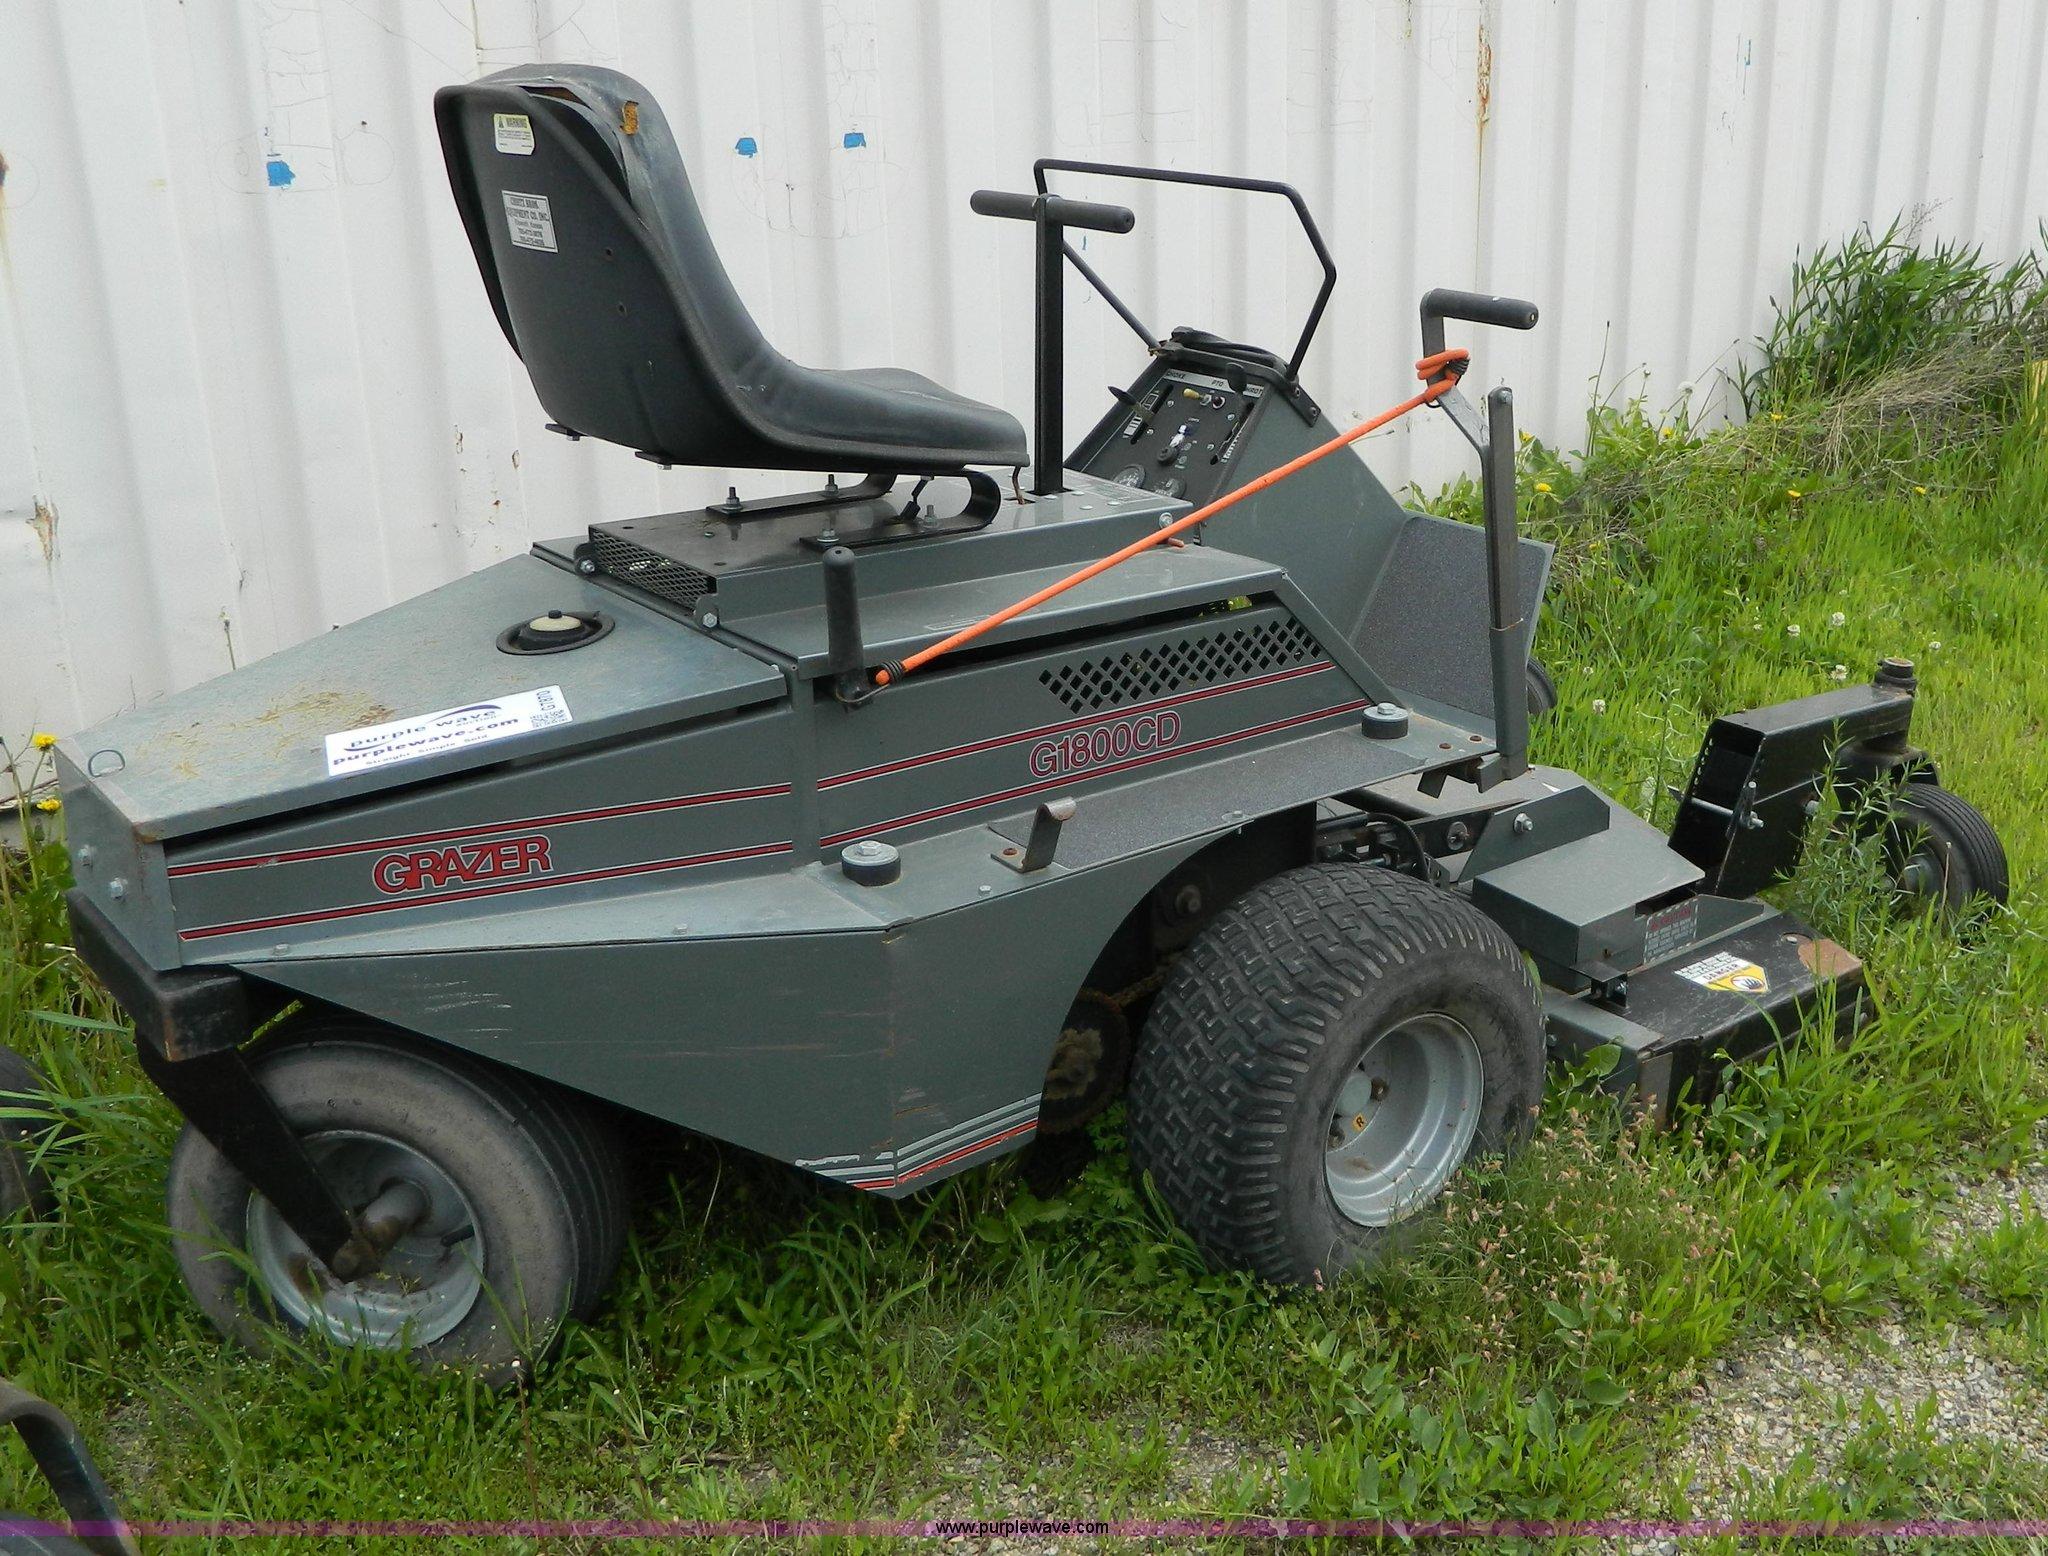 grazer g1800c lawn mower item g7870 sold june 12 ag equ rh purplewave com Grazer Mower Parts Diagram Grazer Mower 52